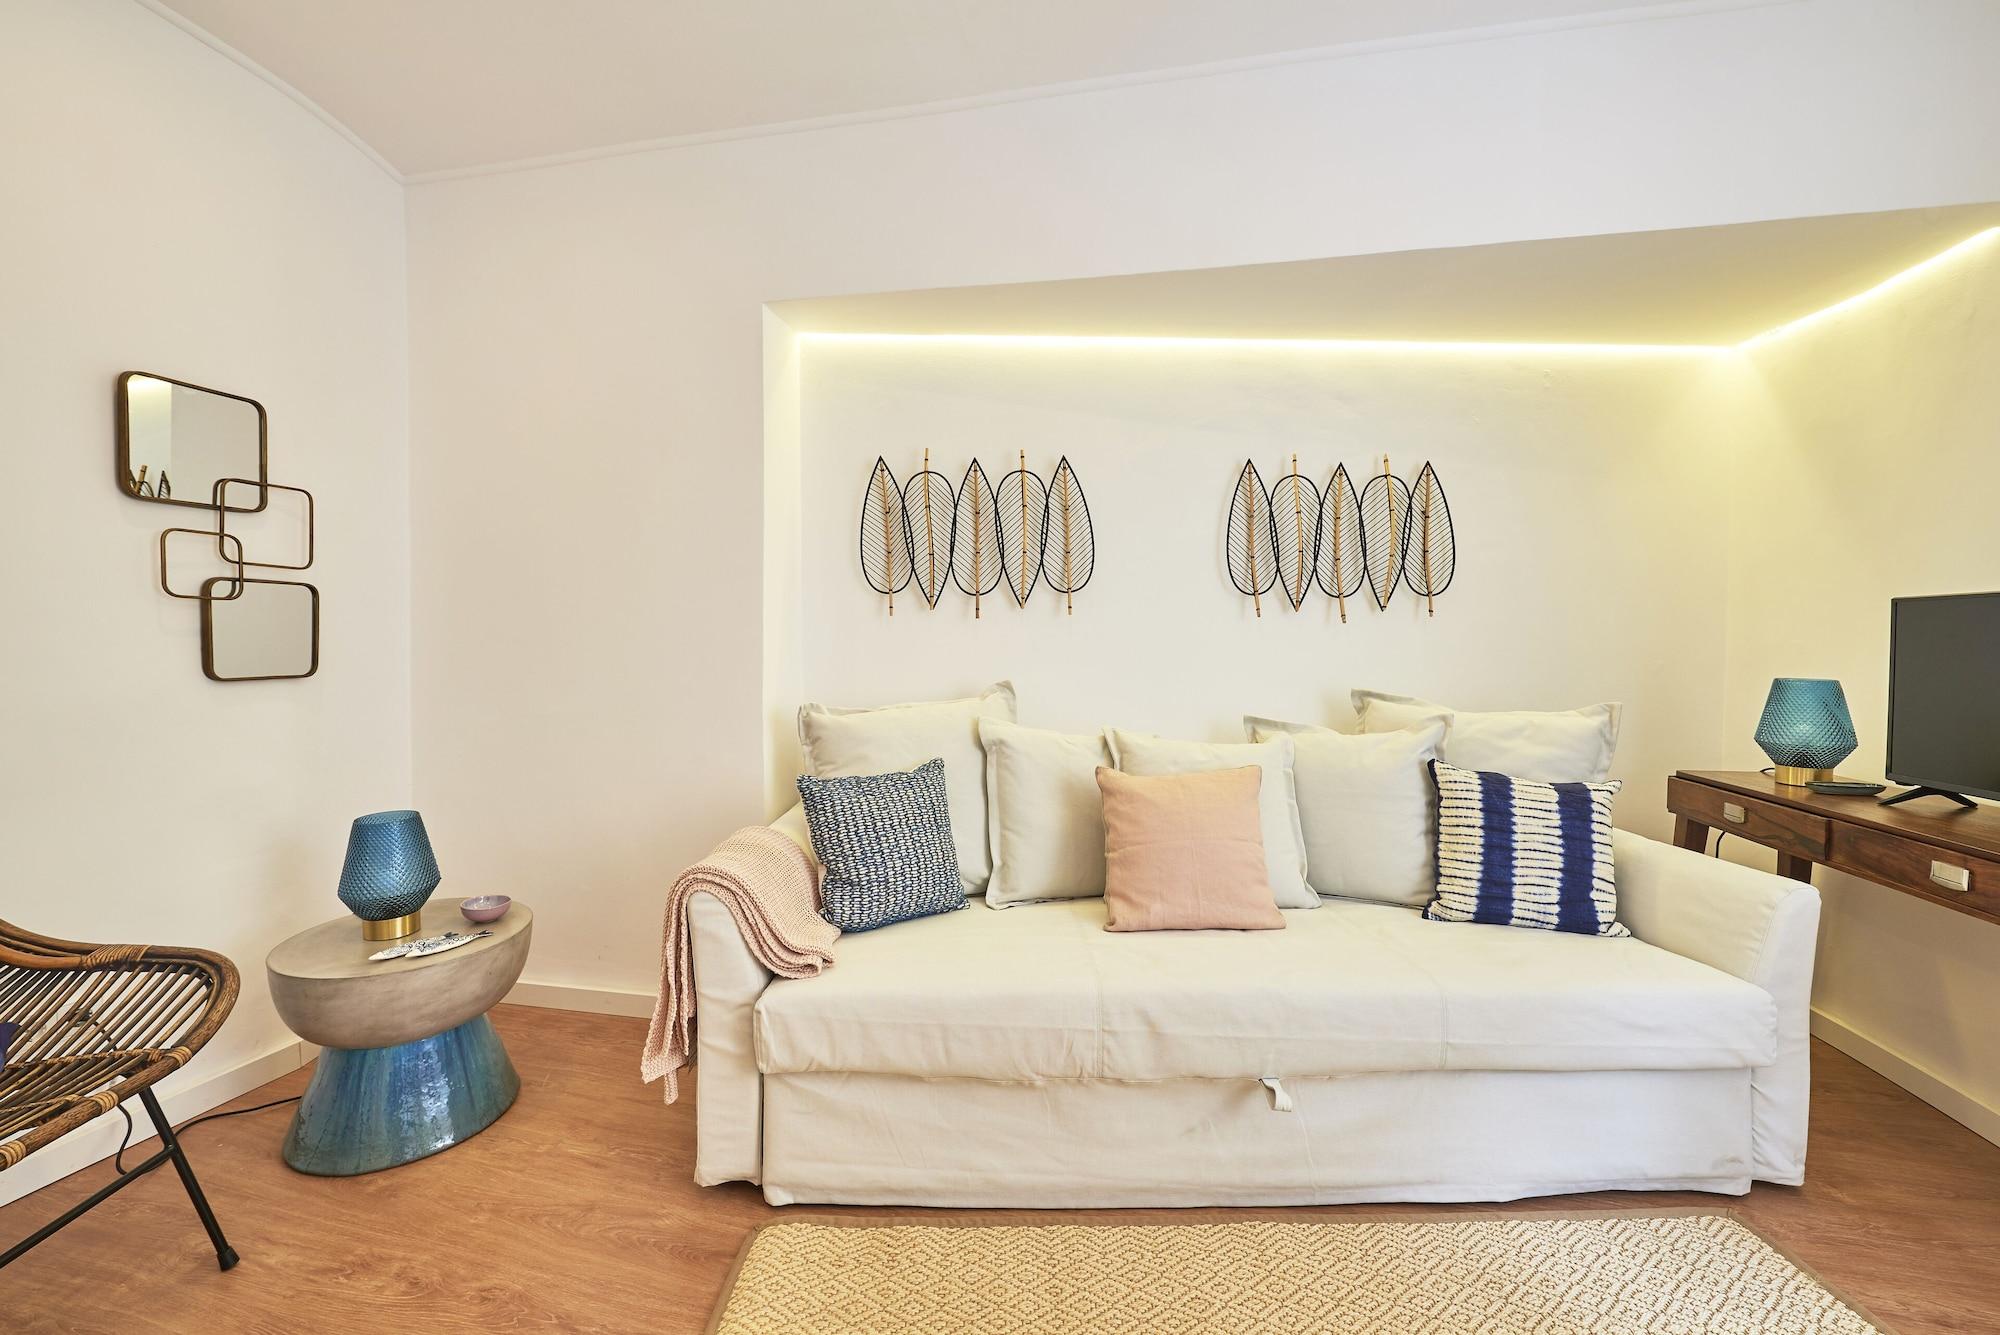 Belém Light Filled Apartment + Free Pick-Up, By TimeCooler, Lisboa